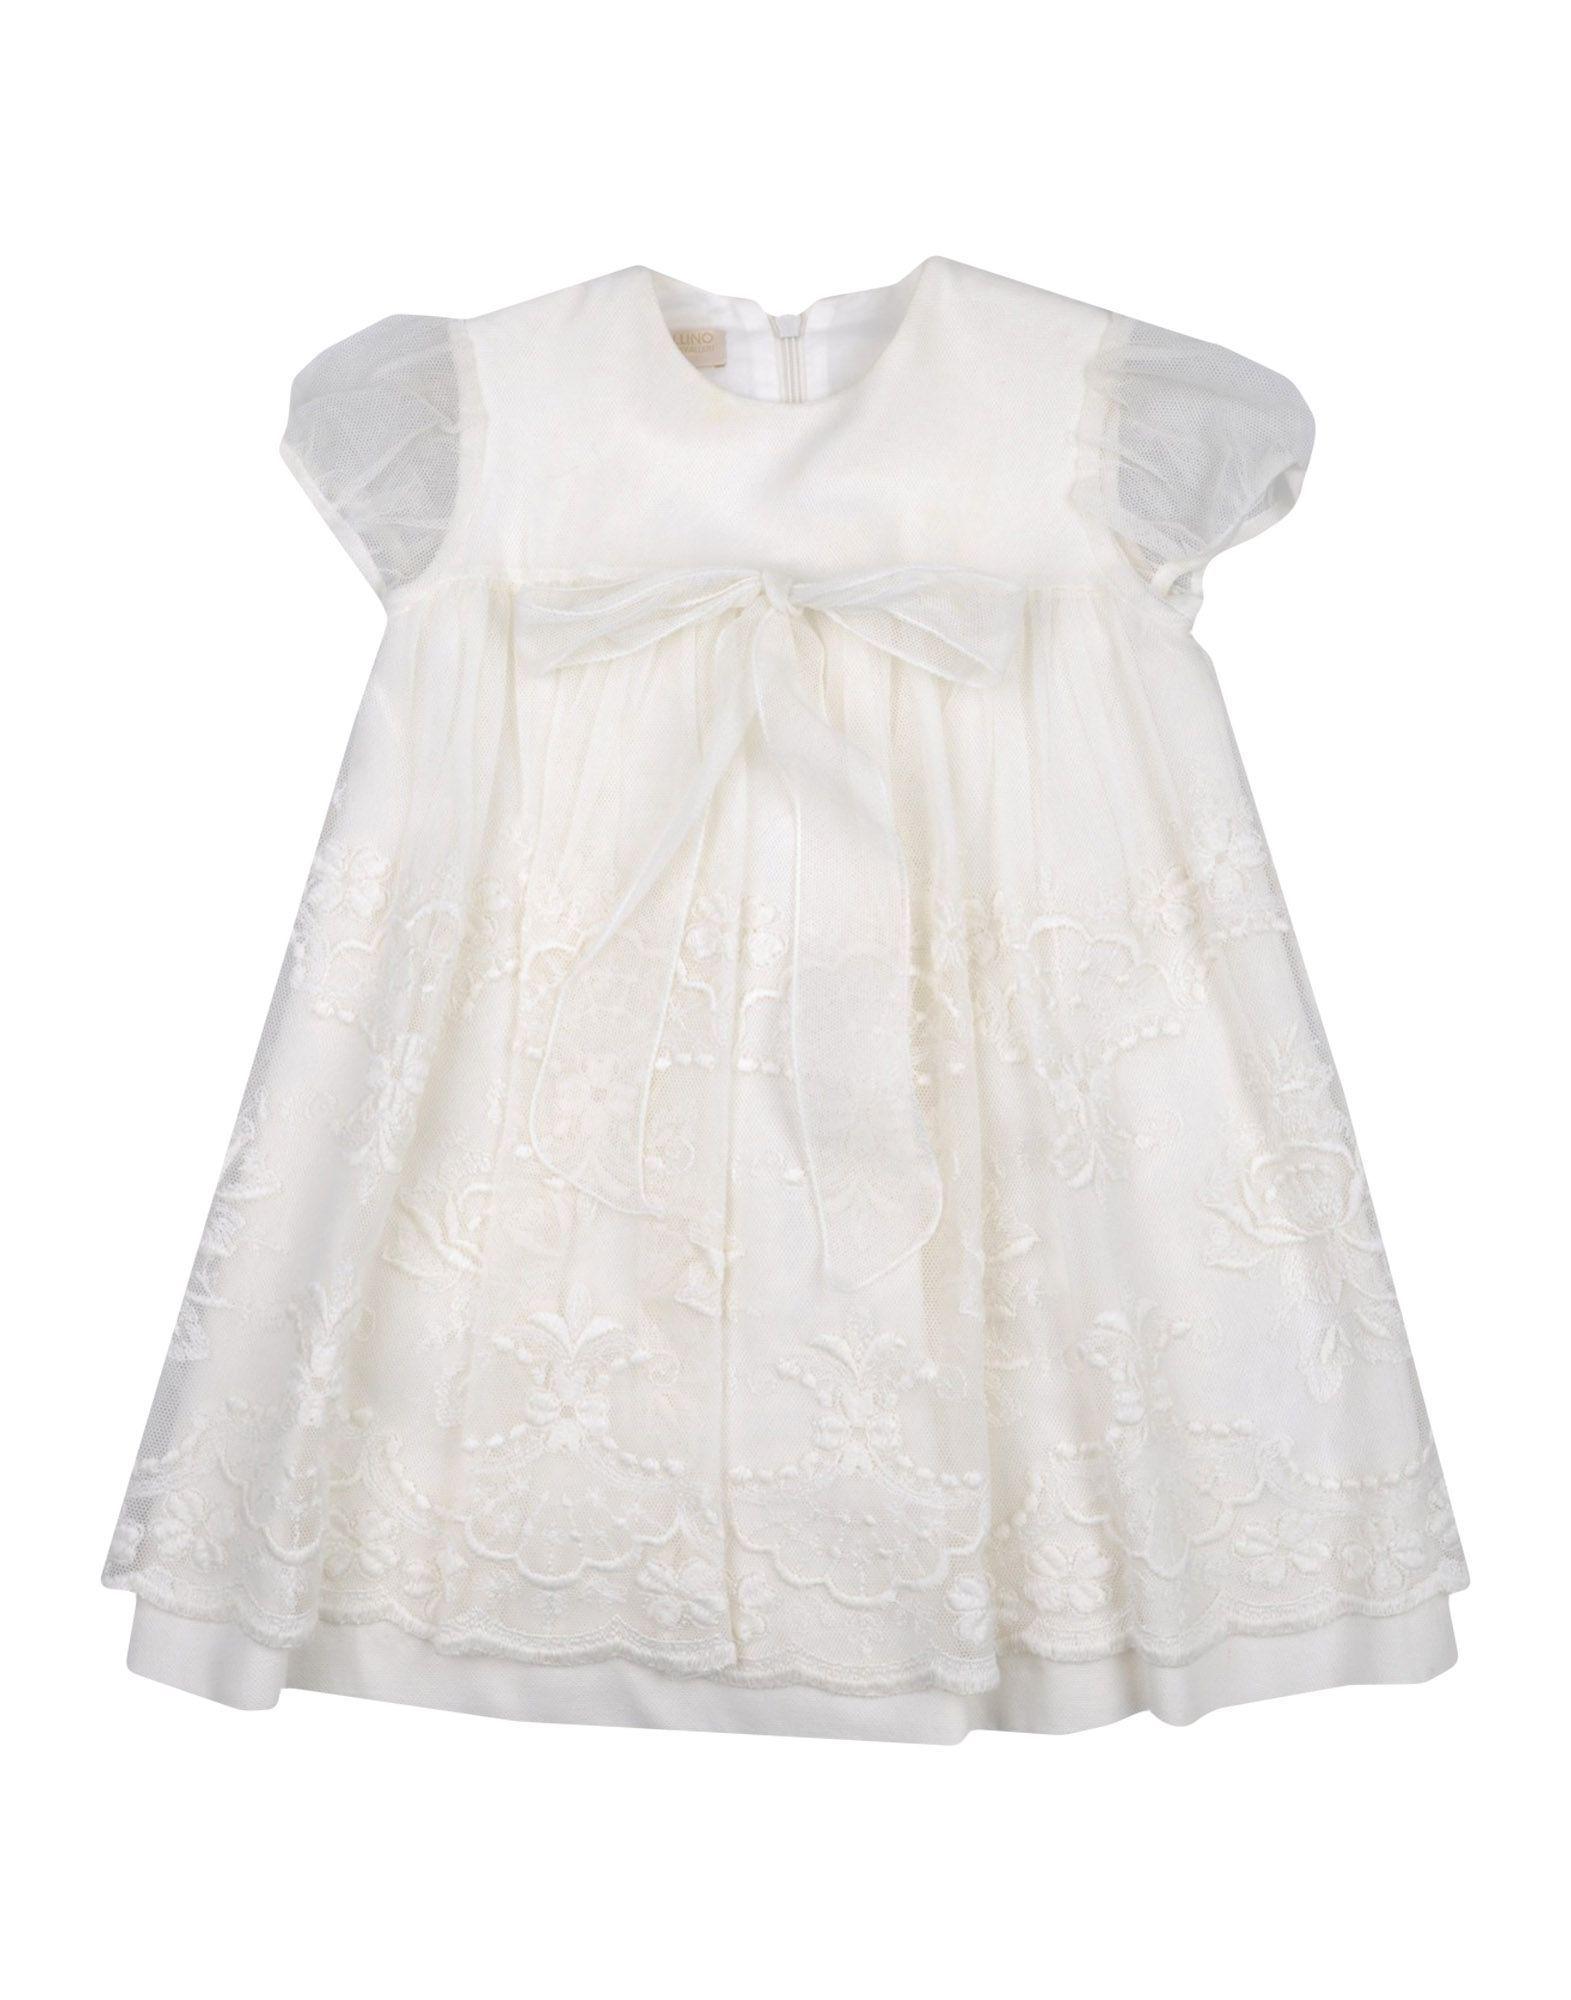 BODYSUITS & SETS I Pinco Pallino Ivory Girl Cotton